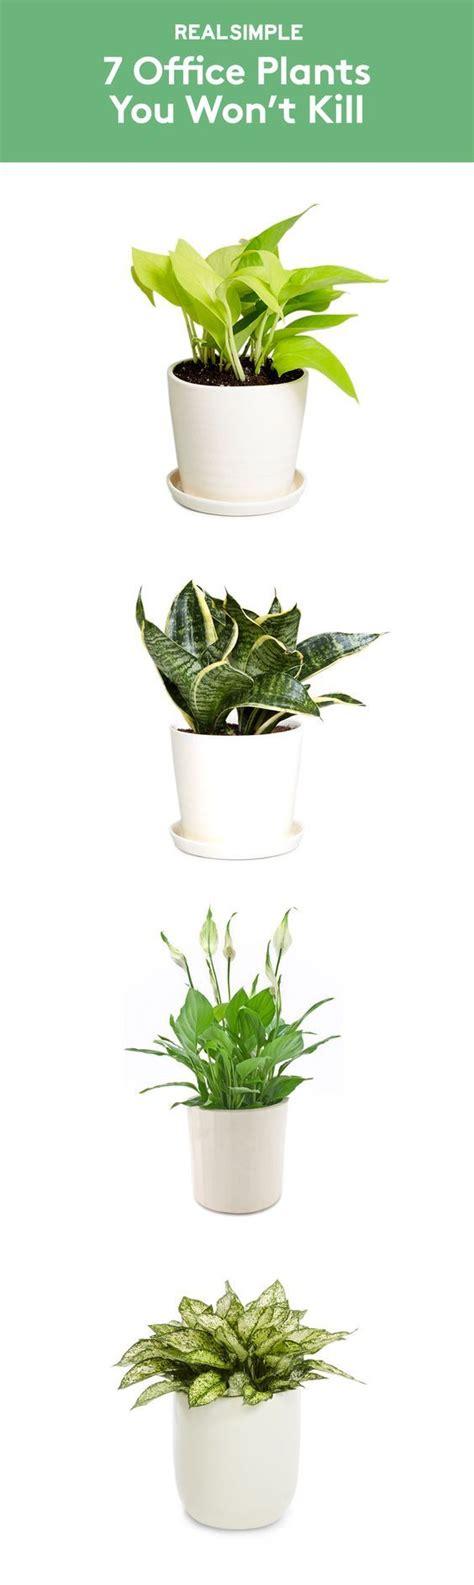 sunlight l for plants 6177 best c u b i c l e n a t i o n images on pinterest